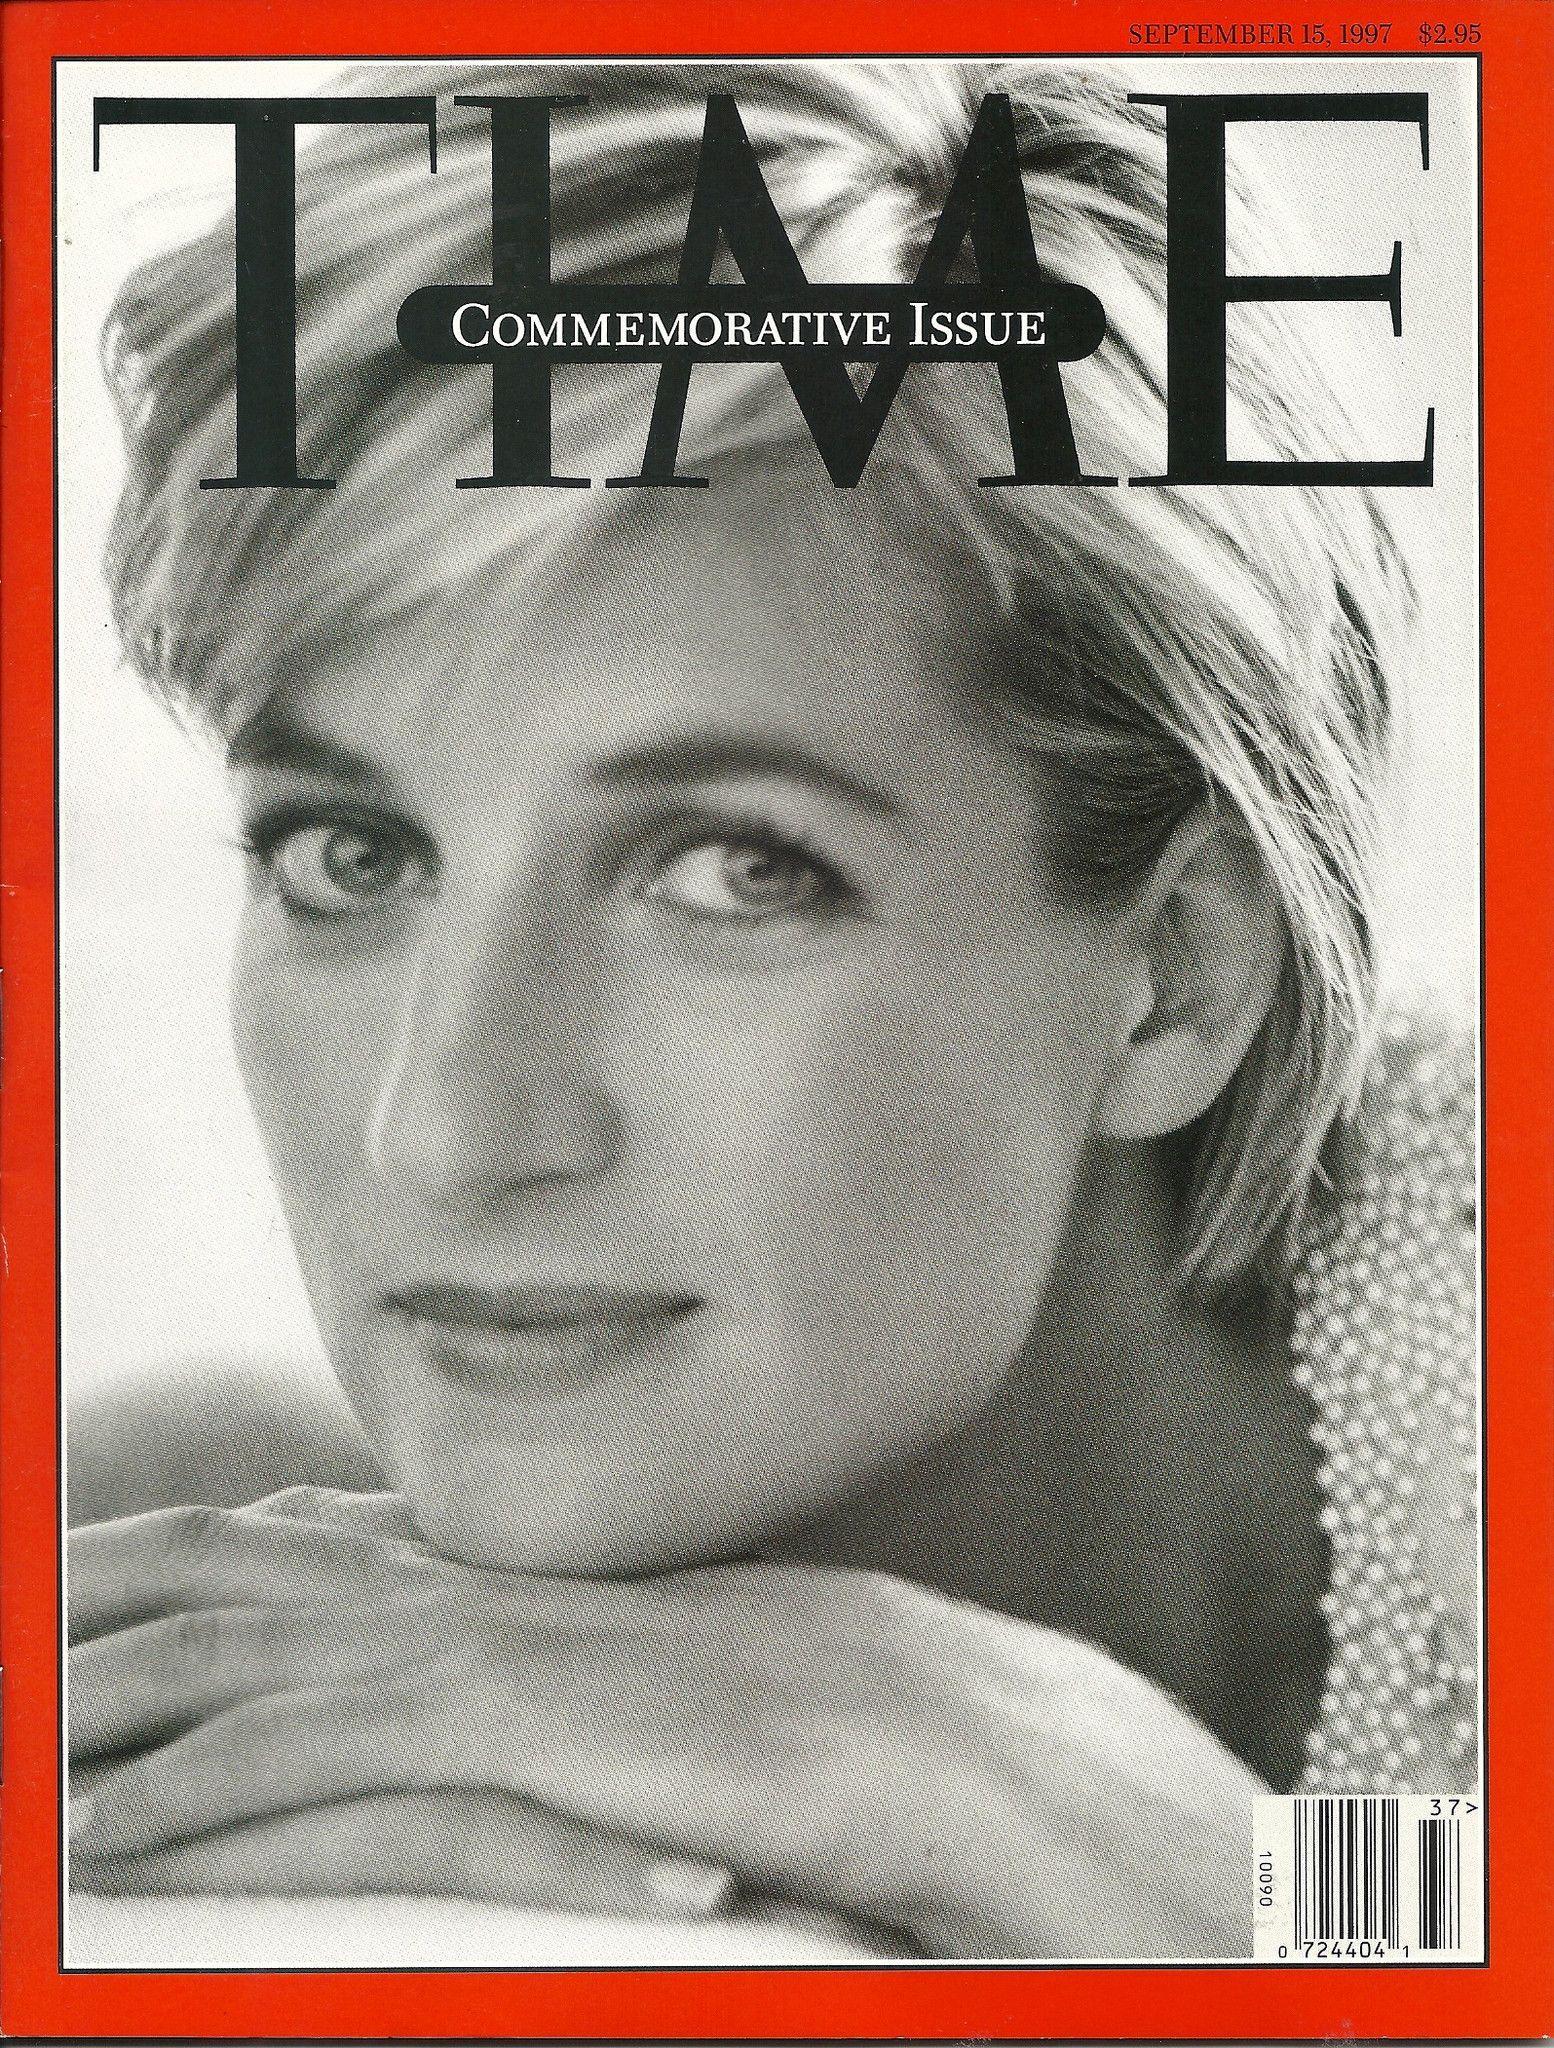 09 15 1997 Time Princess Diana Princess diana, Lady